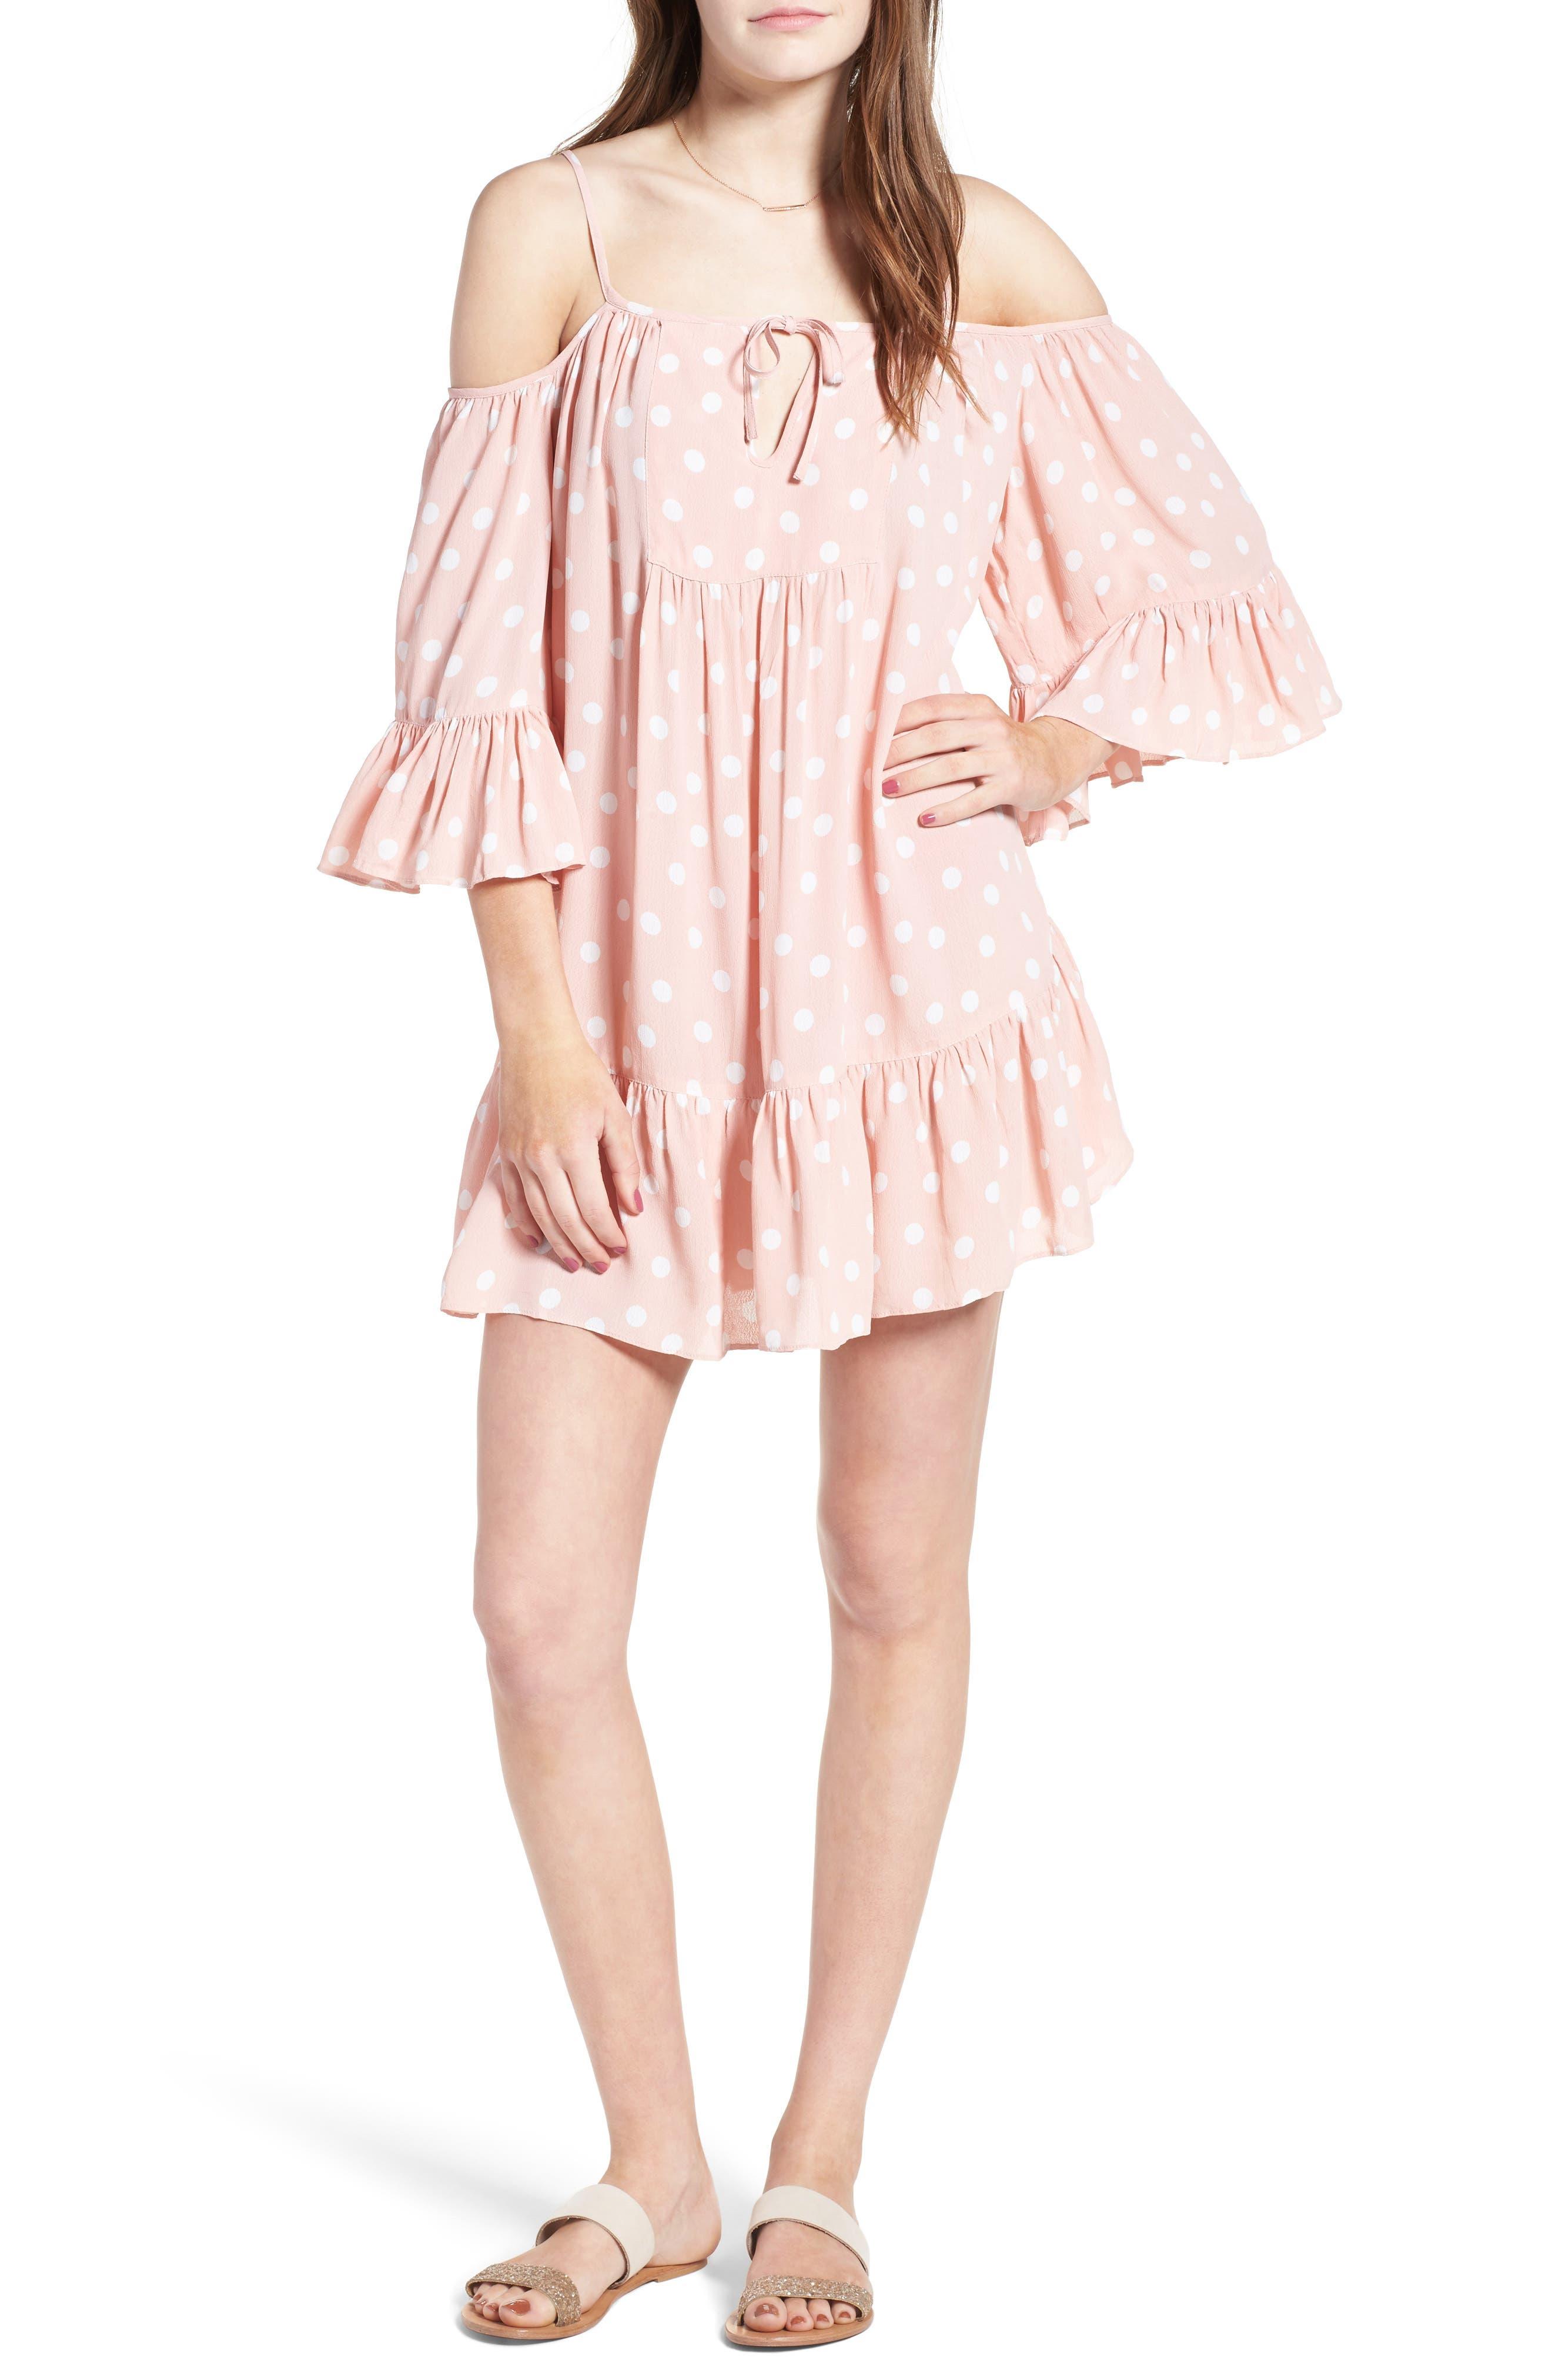 Alternate Image 1 Selected - Tularosa Hattie Shift Dress (Nordstrom Exclusive)